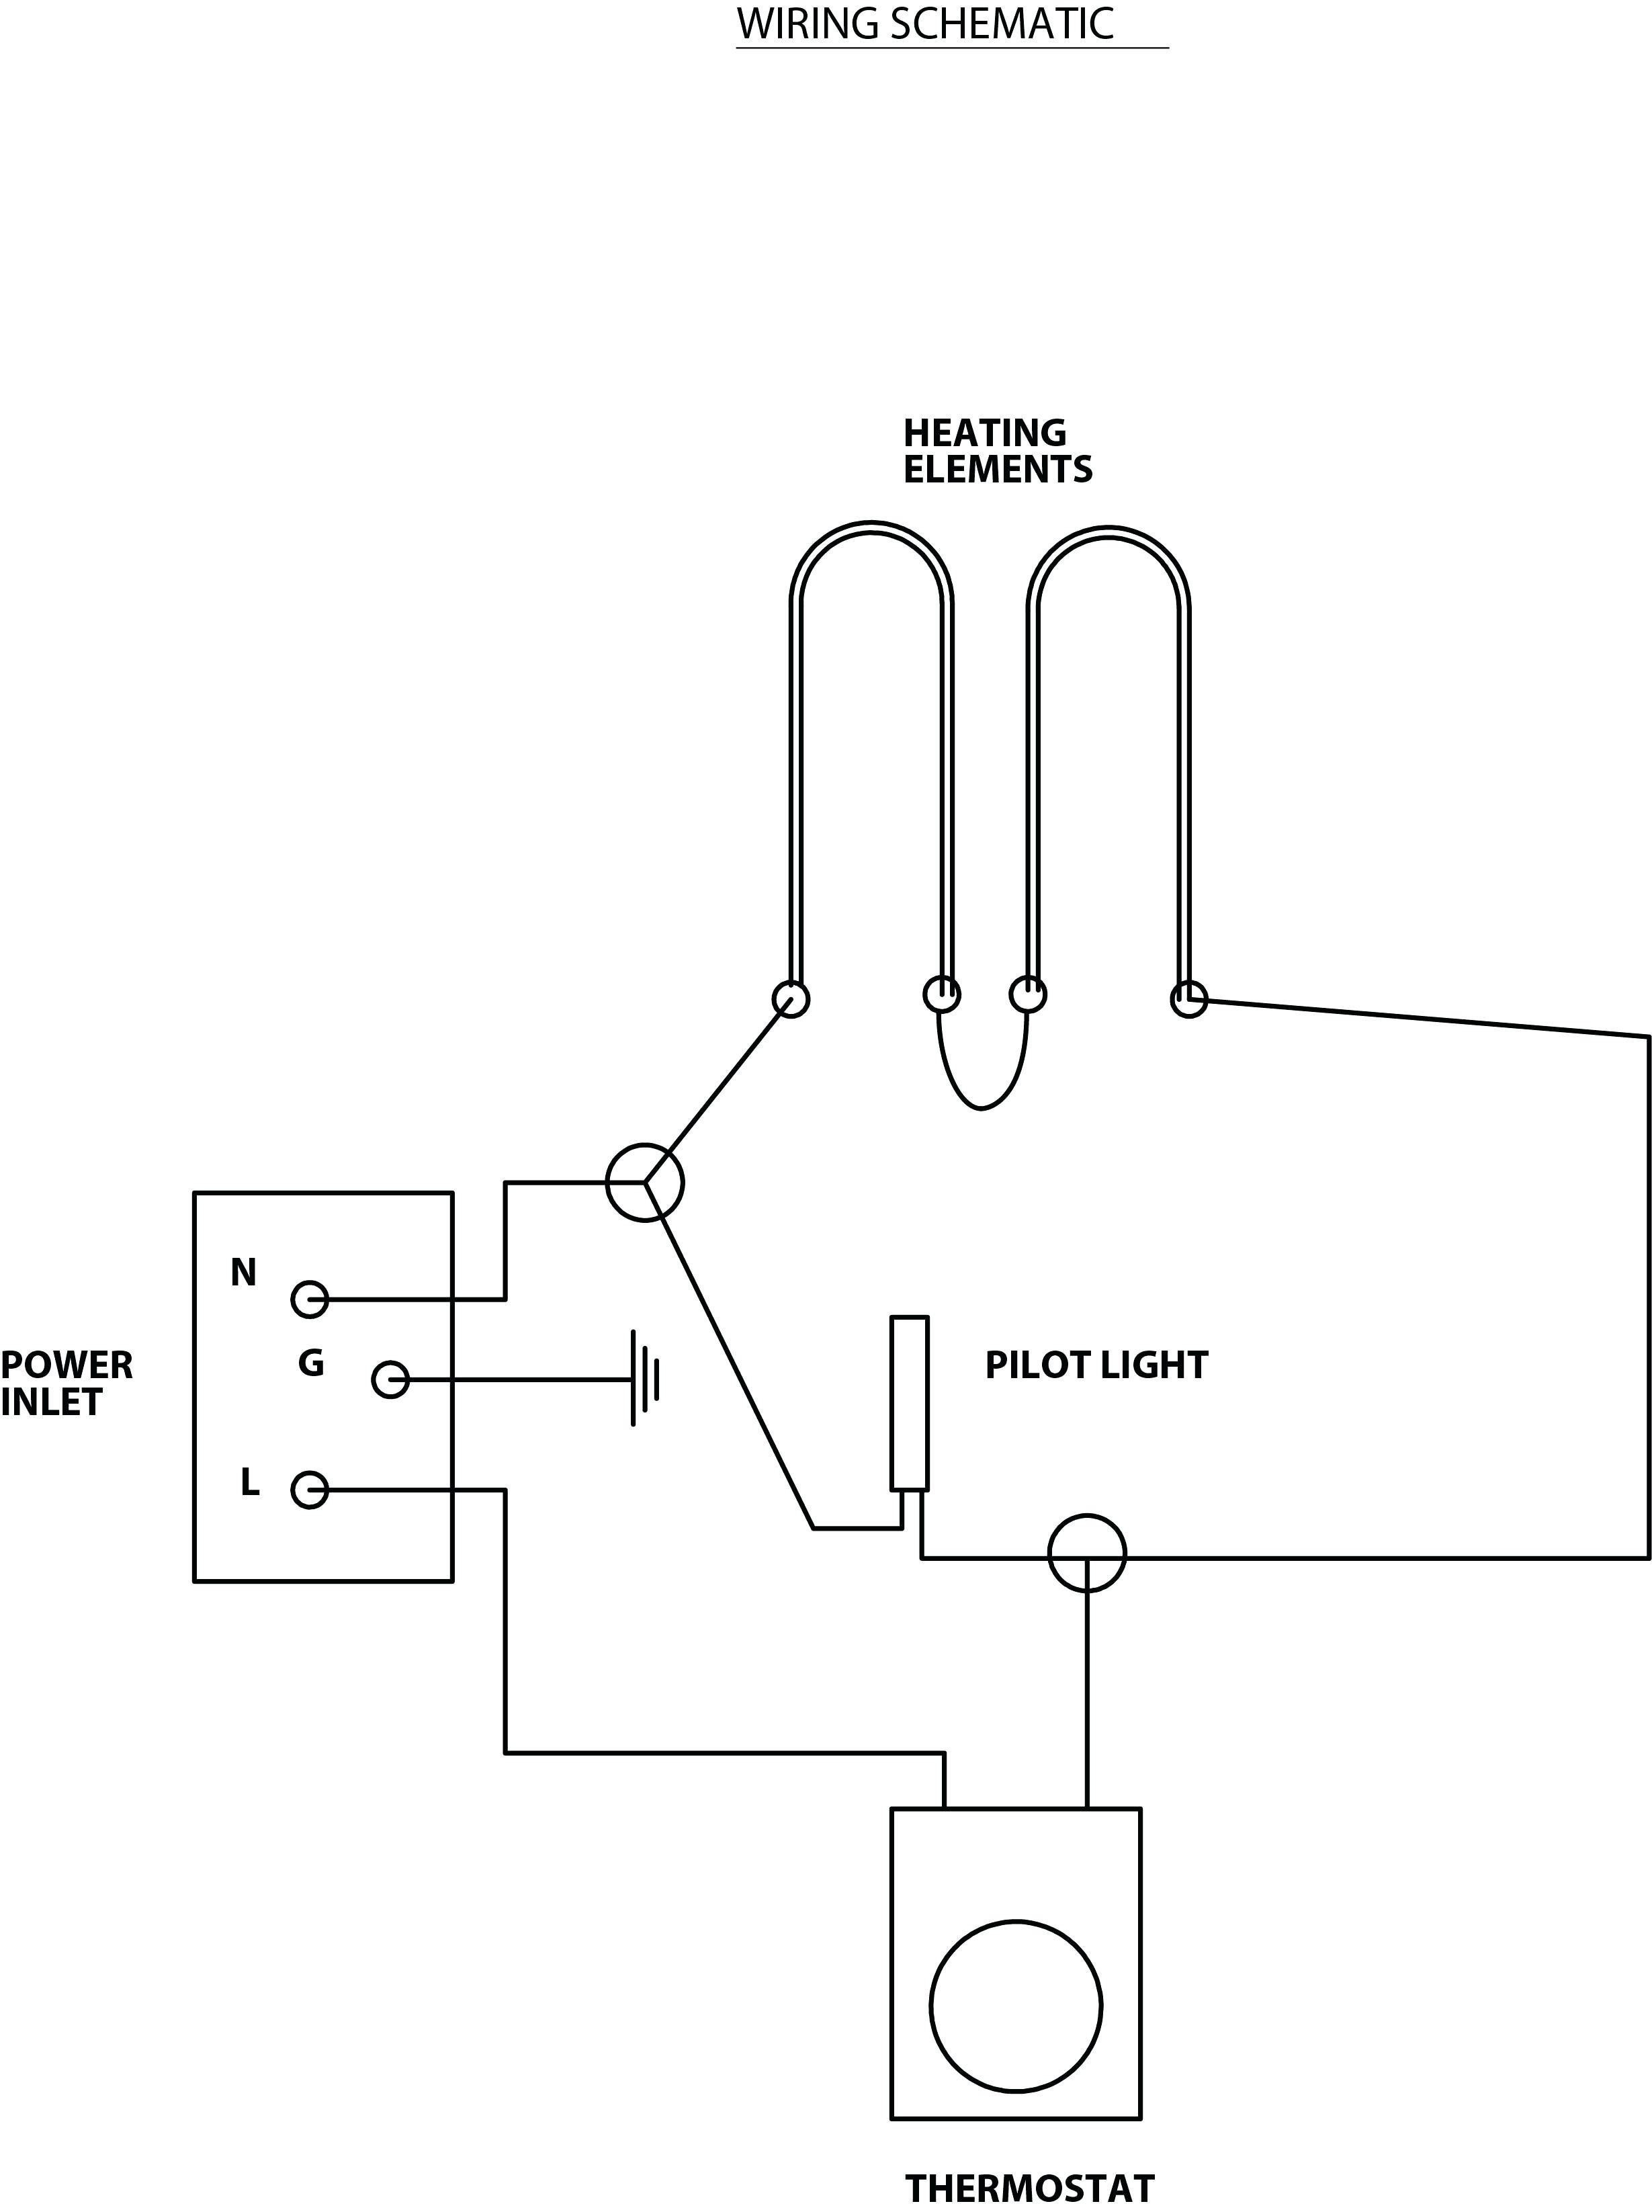 marley electric baseboard heater wiring diagram Collection-Marley Electric Baseboard Heater Wiring 14-h